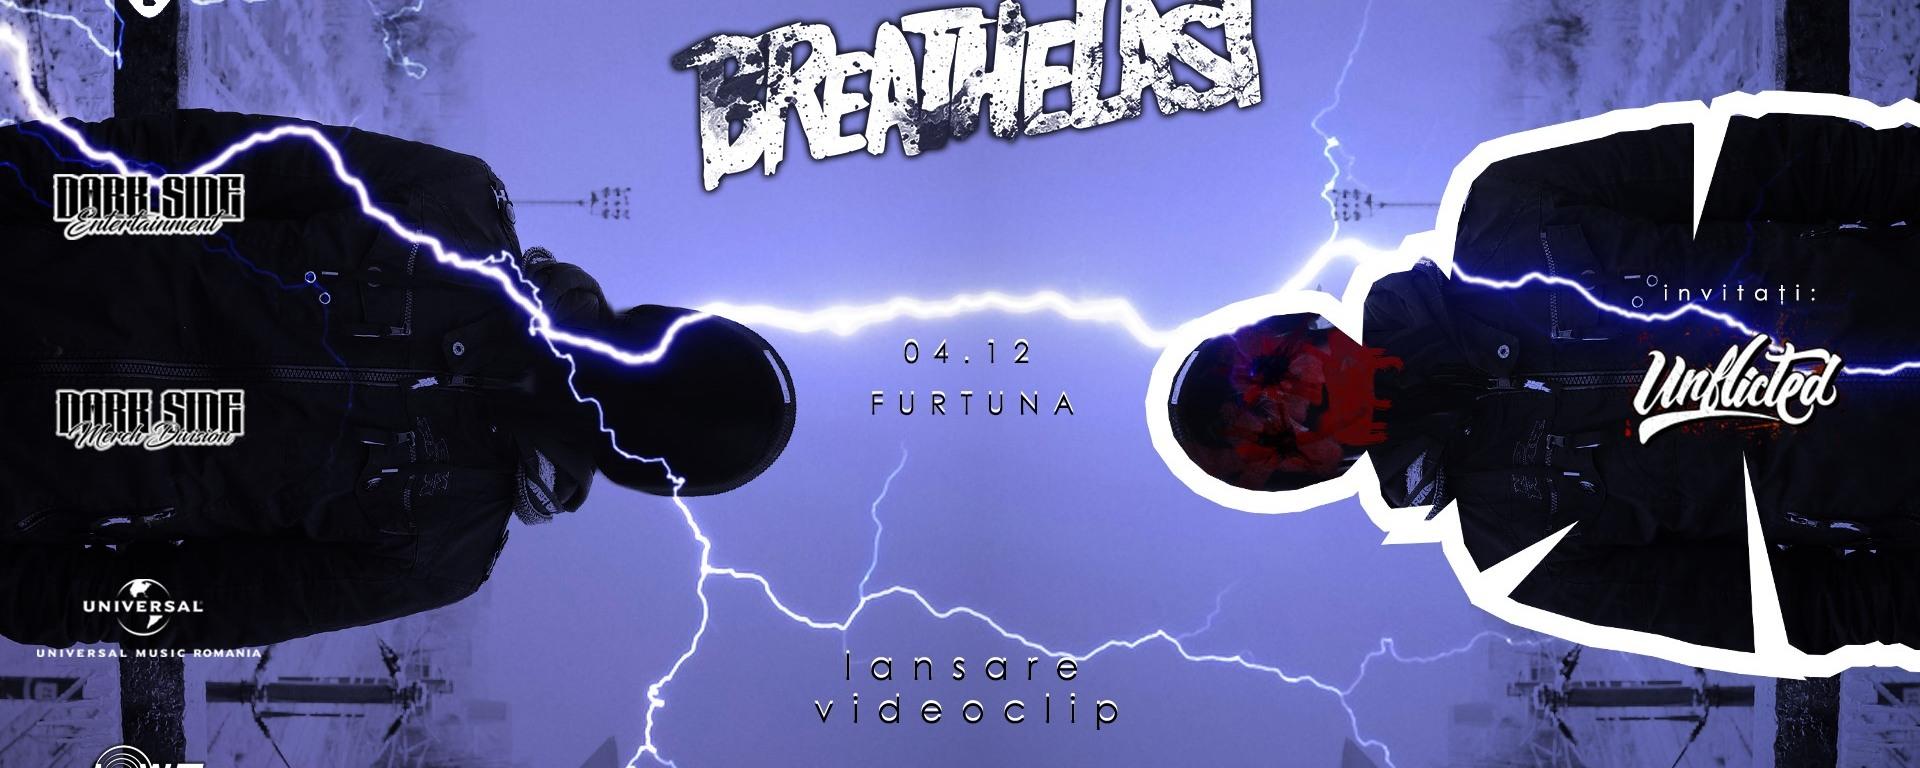 Breathelast lansare Furtuna I Unflicted live at Control - Contemporary-Establishment